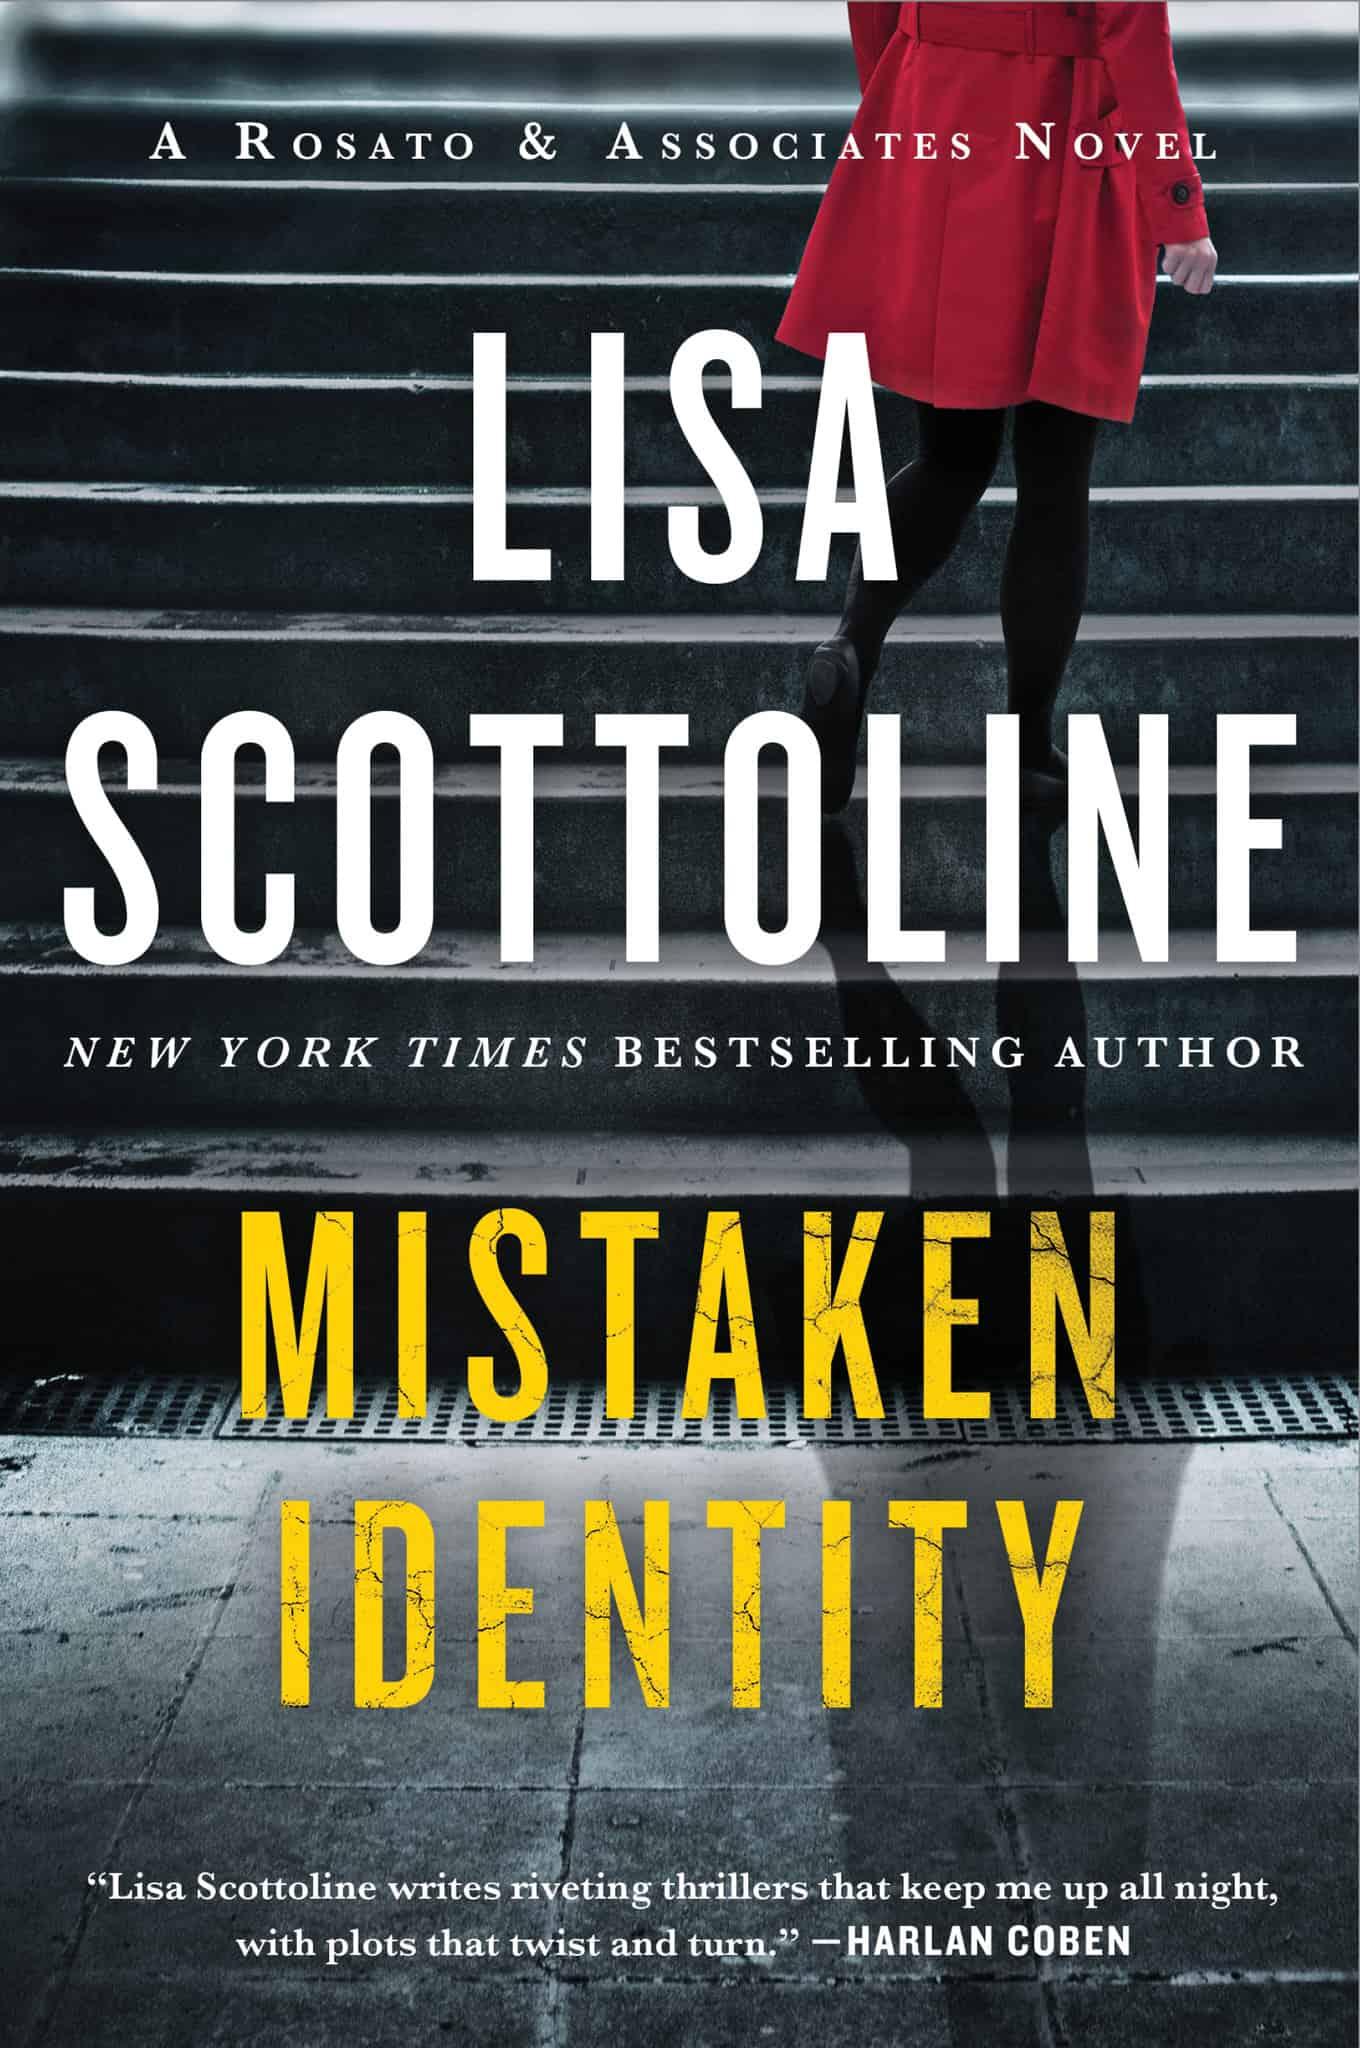 Mistaken Identity book cover